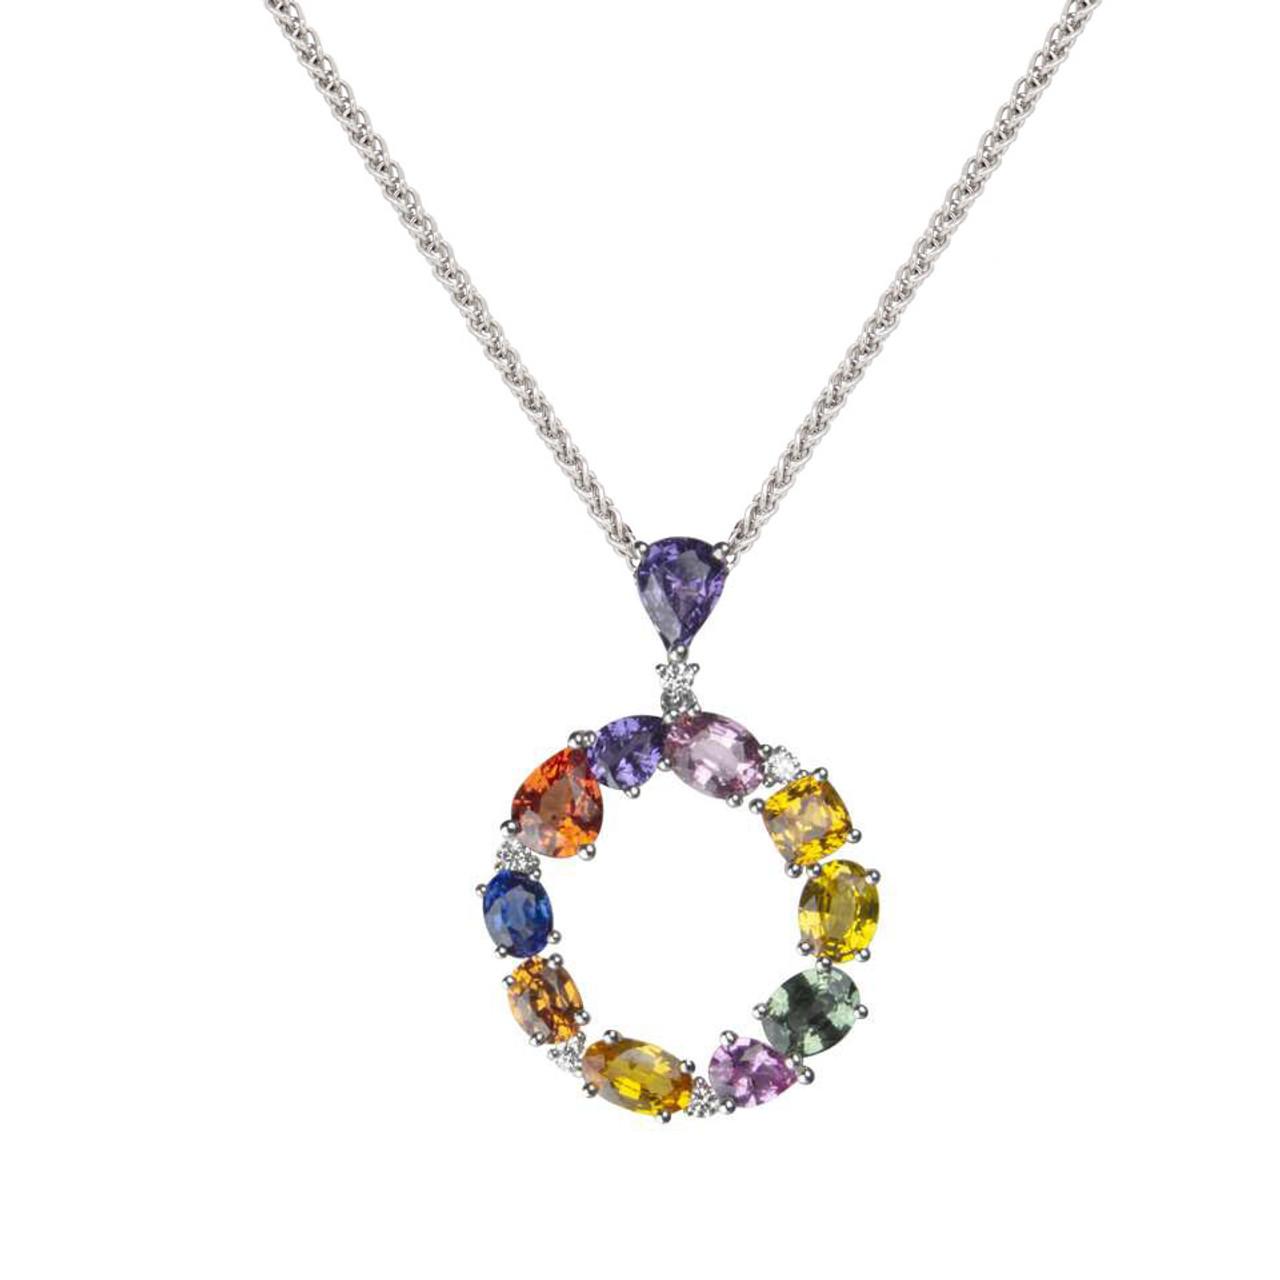 18ct White Gold multi-coloured Sapphire & Diamond circle Pendant on Chain